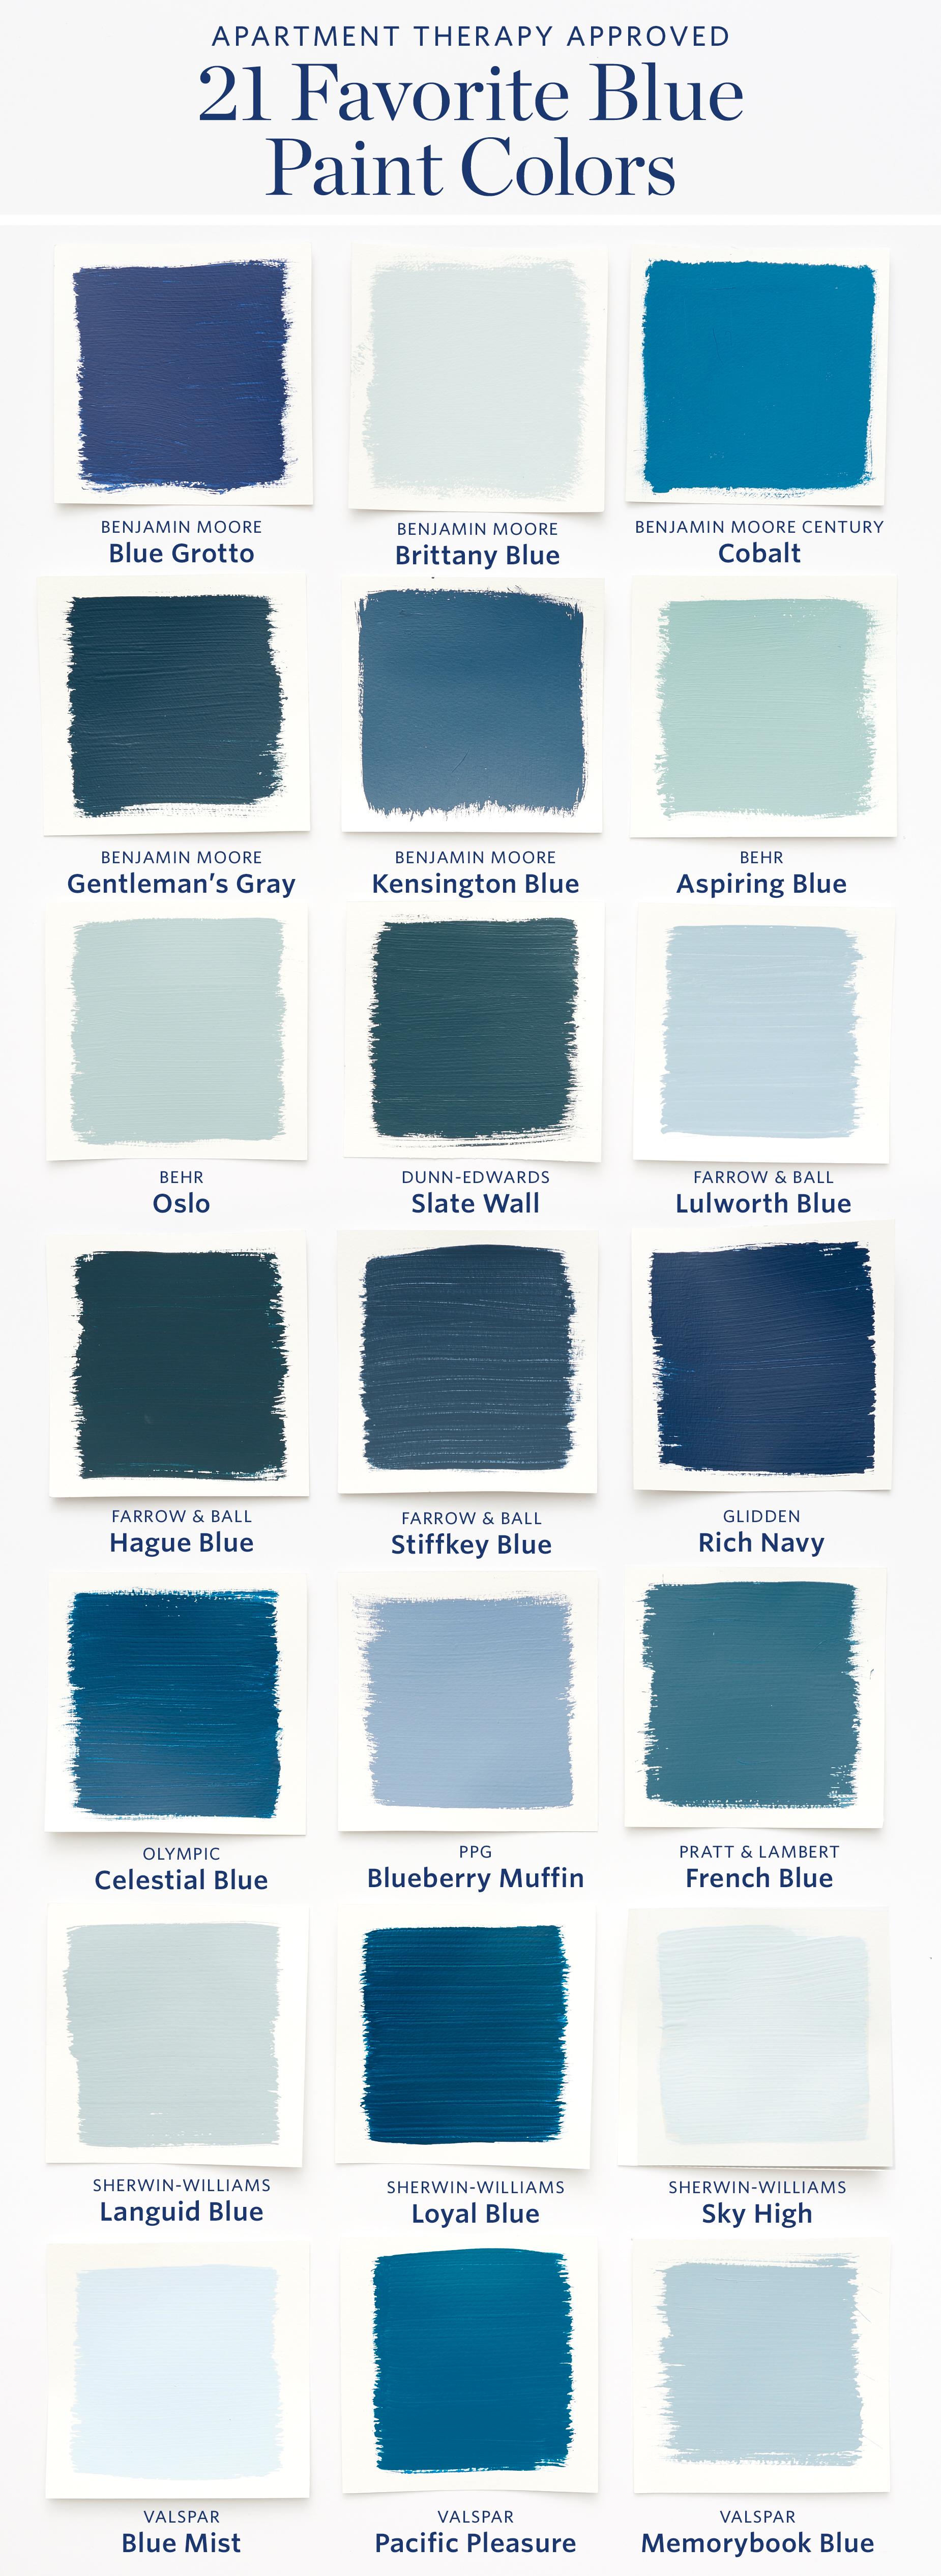 Color Cheat Sheet The 21 Most Perfect Blue Paint Colors For Your Home Raznocvetnye Doma Cveta Kraski Dlya Spalni Cvetovye Shemy